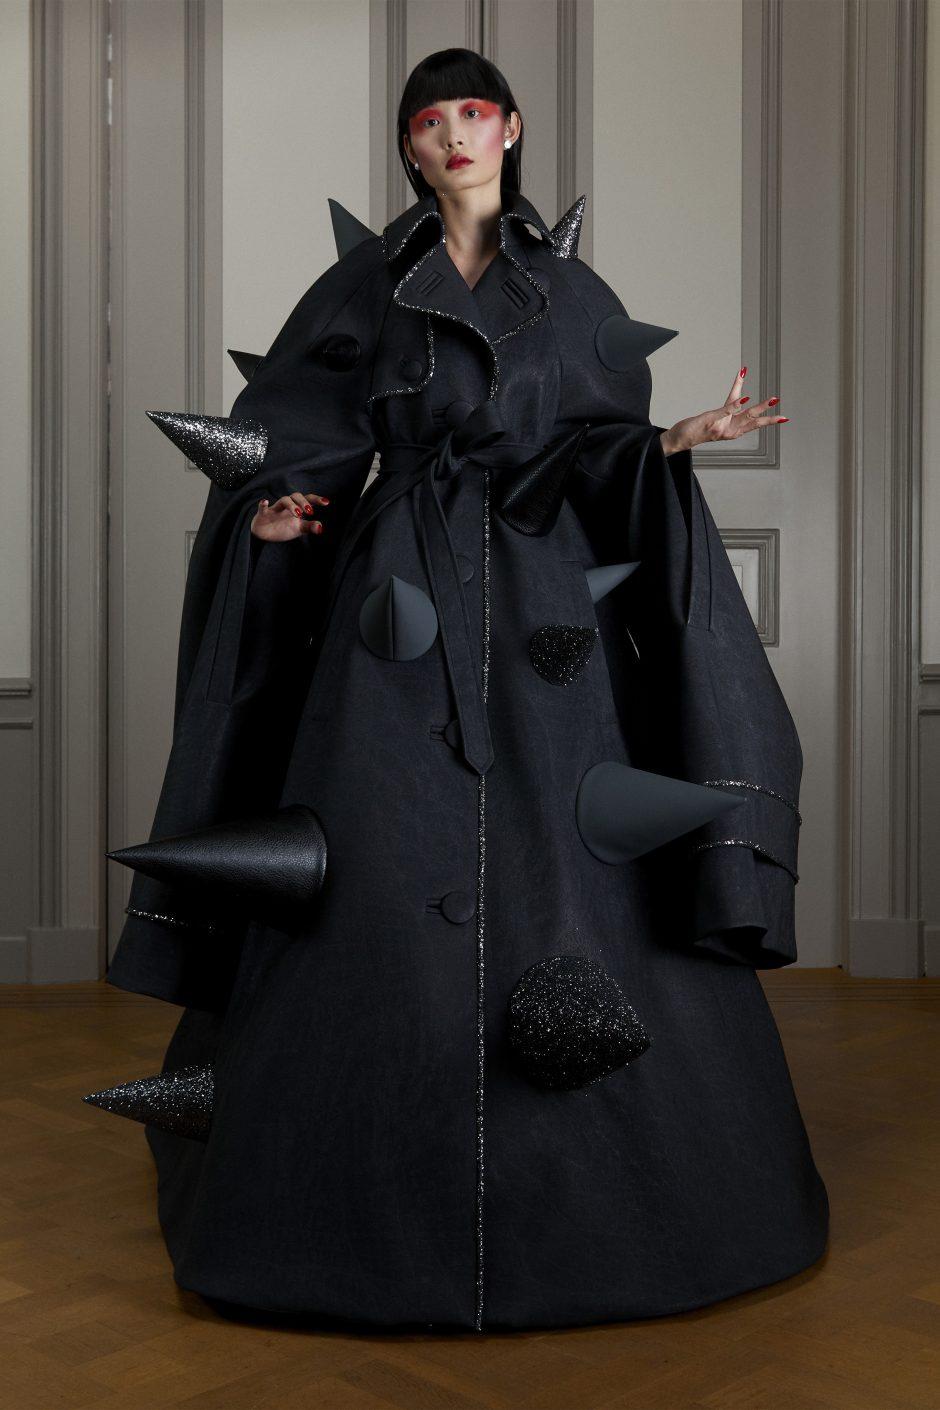 00003-Viktor-Rolf-Couture-FALL-20-Credit-Casper-Kofi